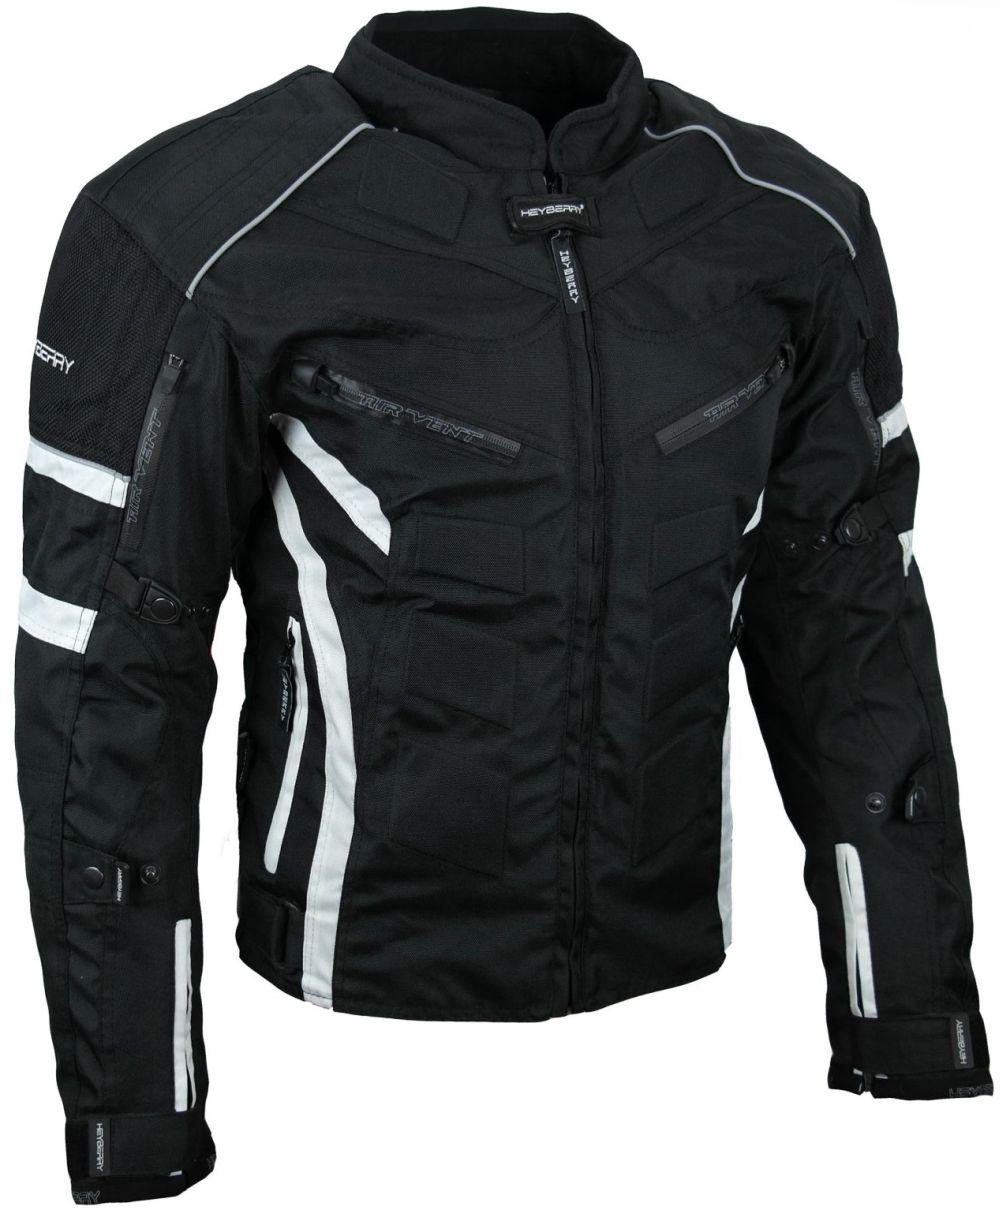 Kurze Textil Motorrad Jacke Motorradjacke Schwarz Weiß Gr. M - 7XL